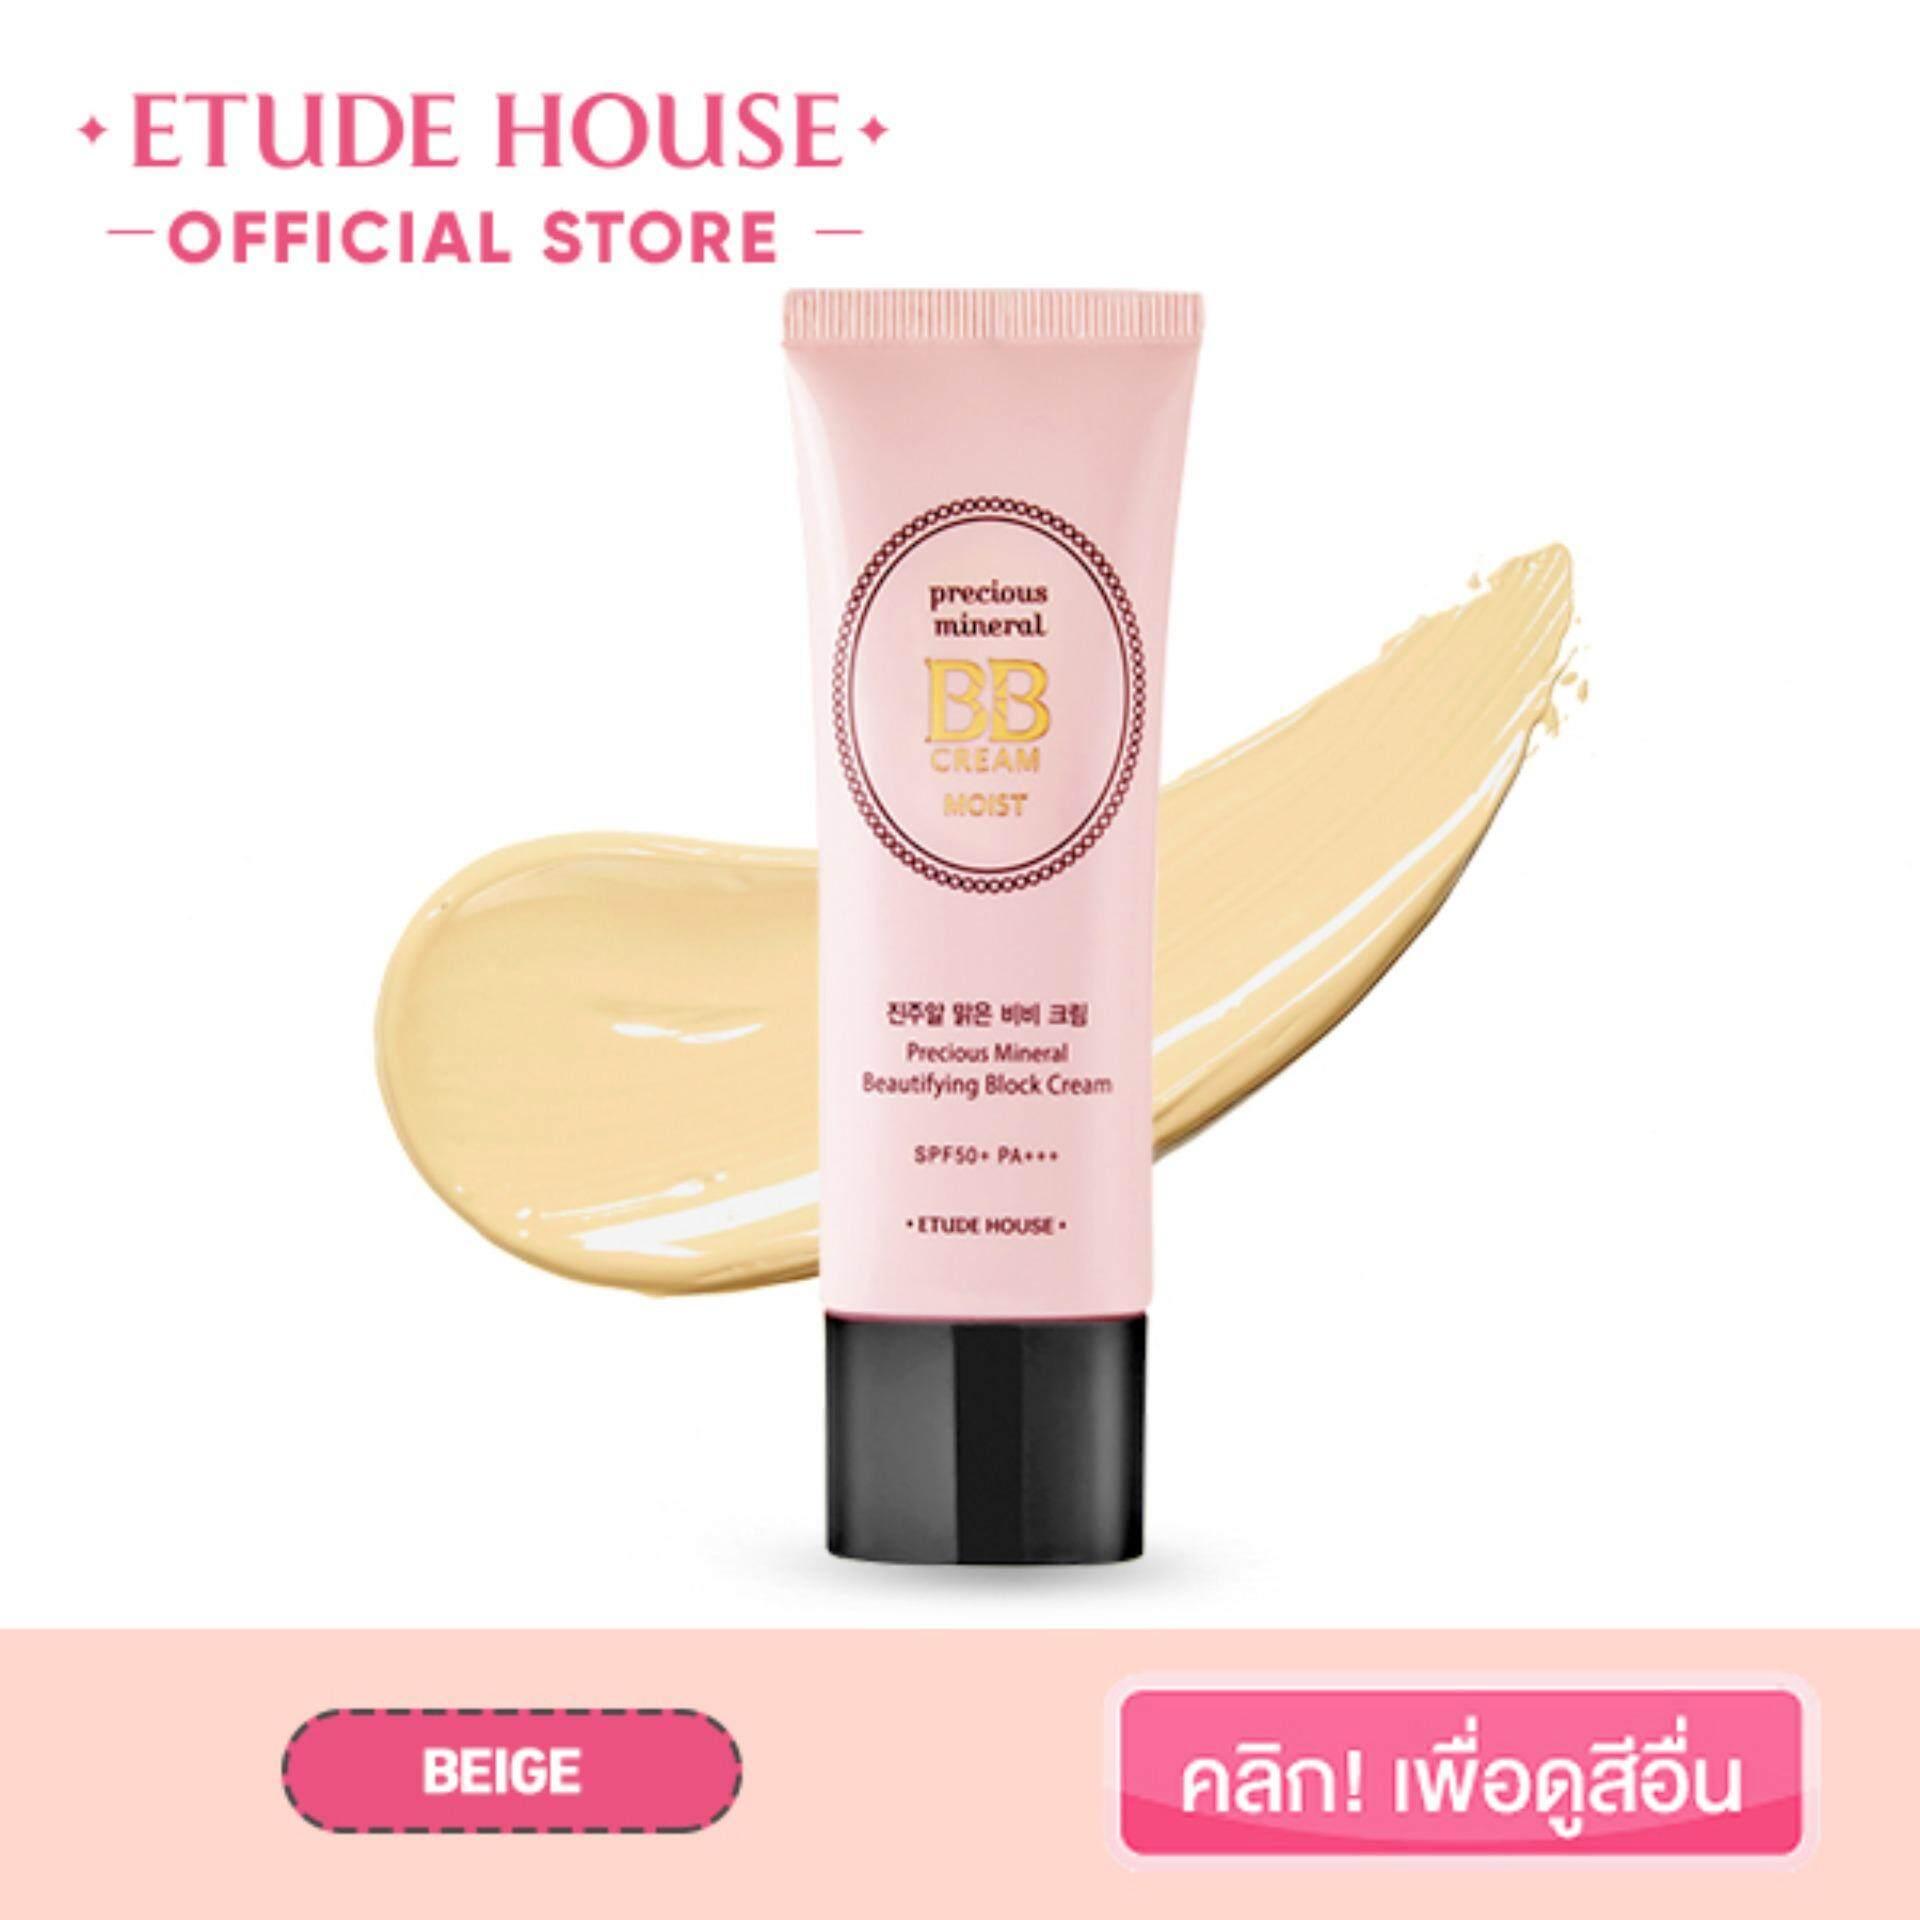 ETUDE HOUSE Precious Mineral Beautifying Block Cream Moist SPF50+ PA+++ #Beige (45 g)